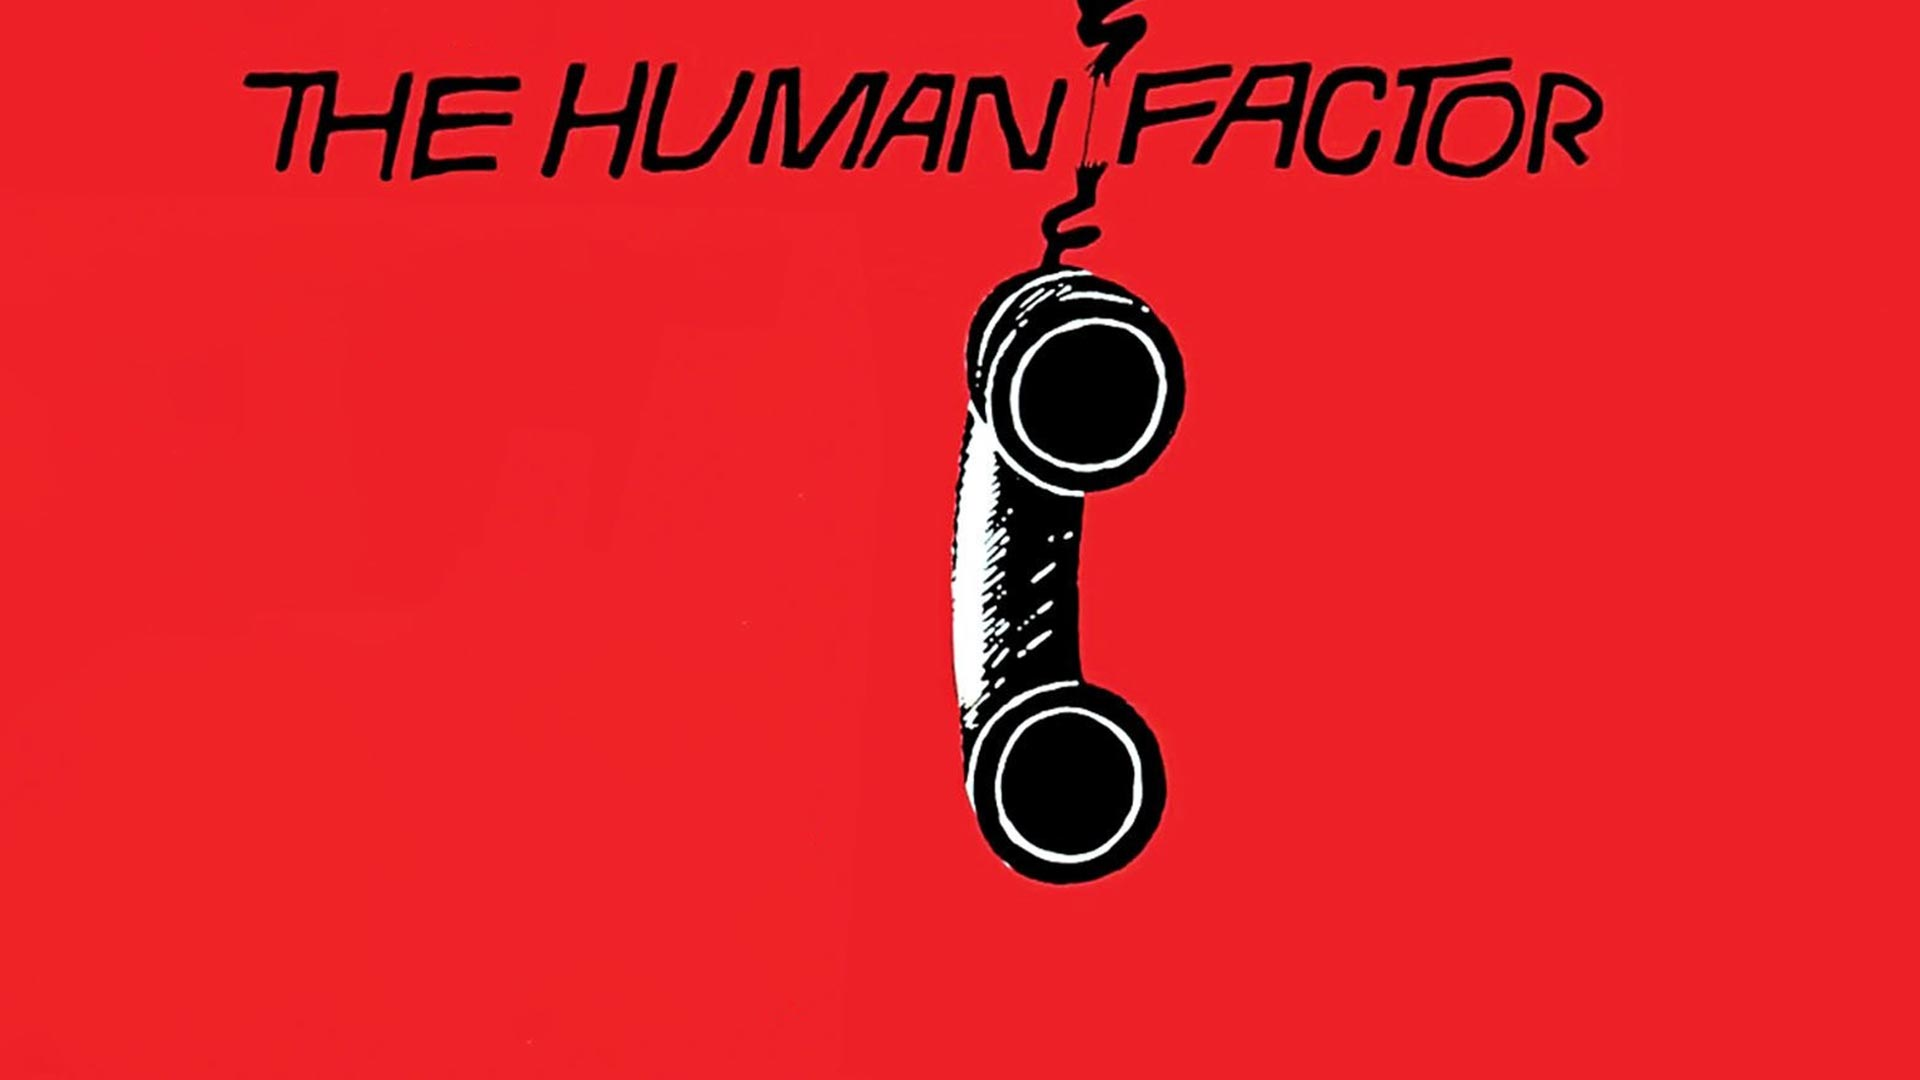 The Human Factor (1979)